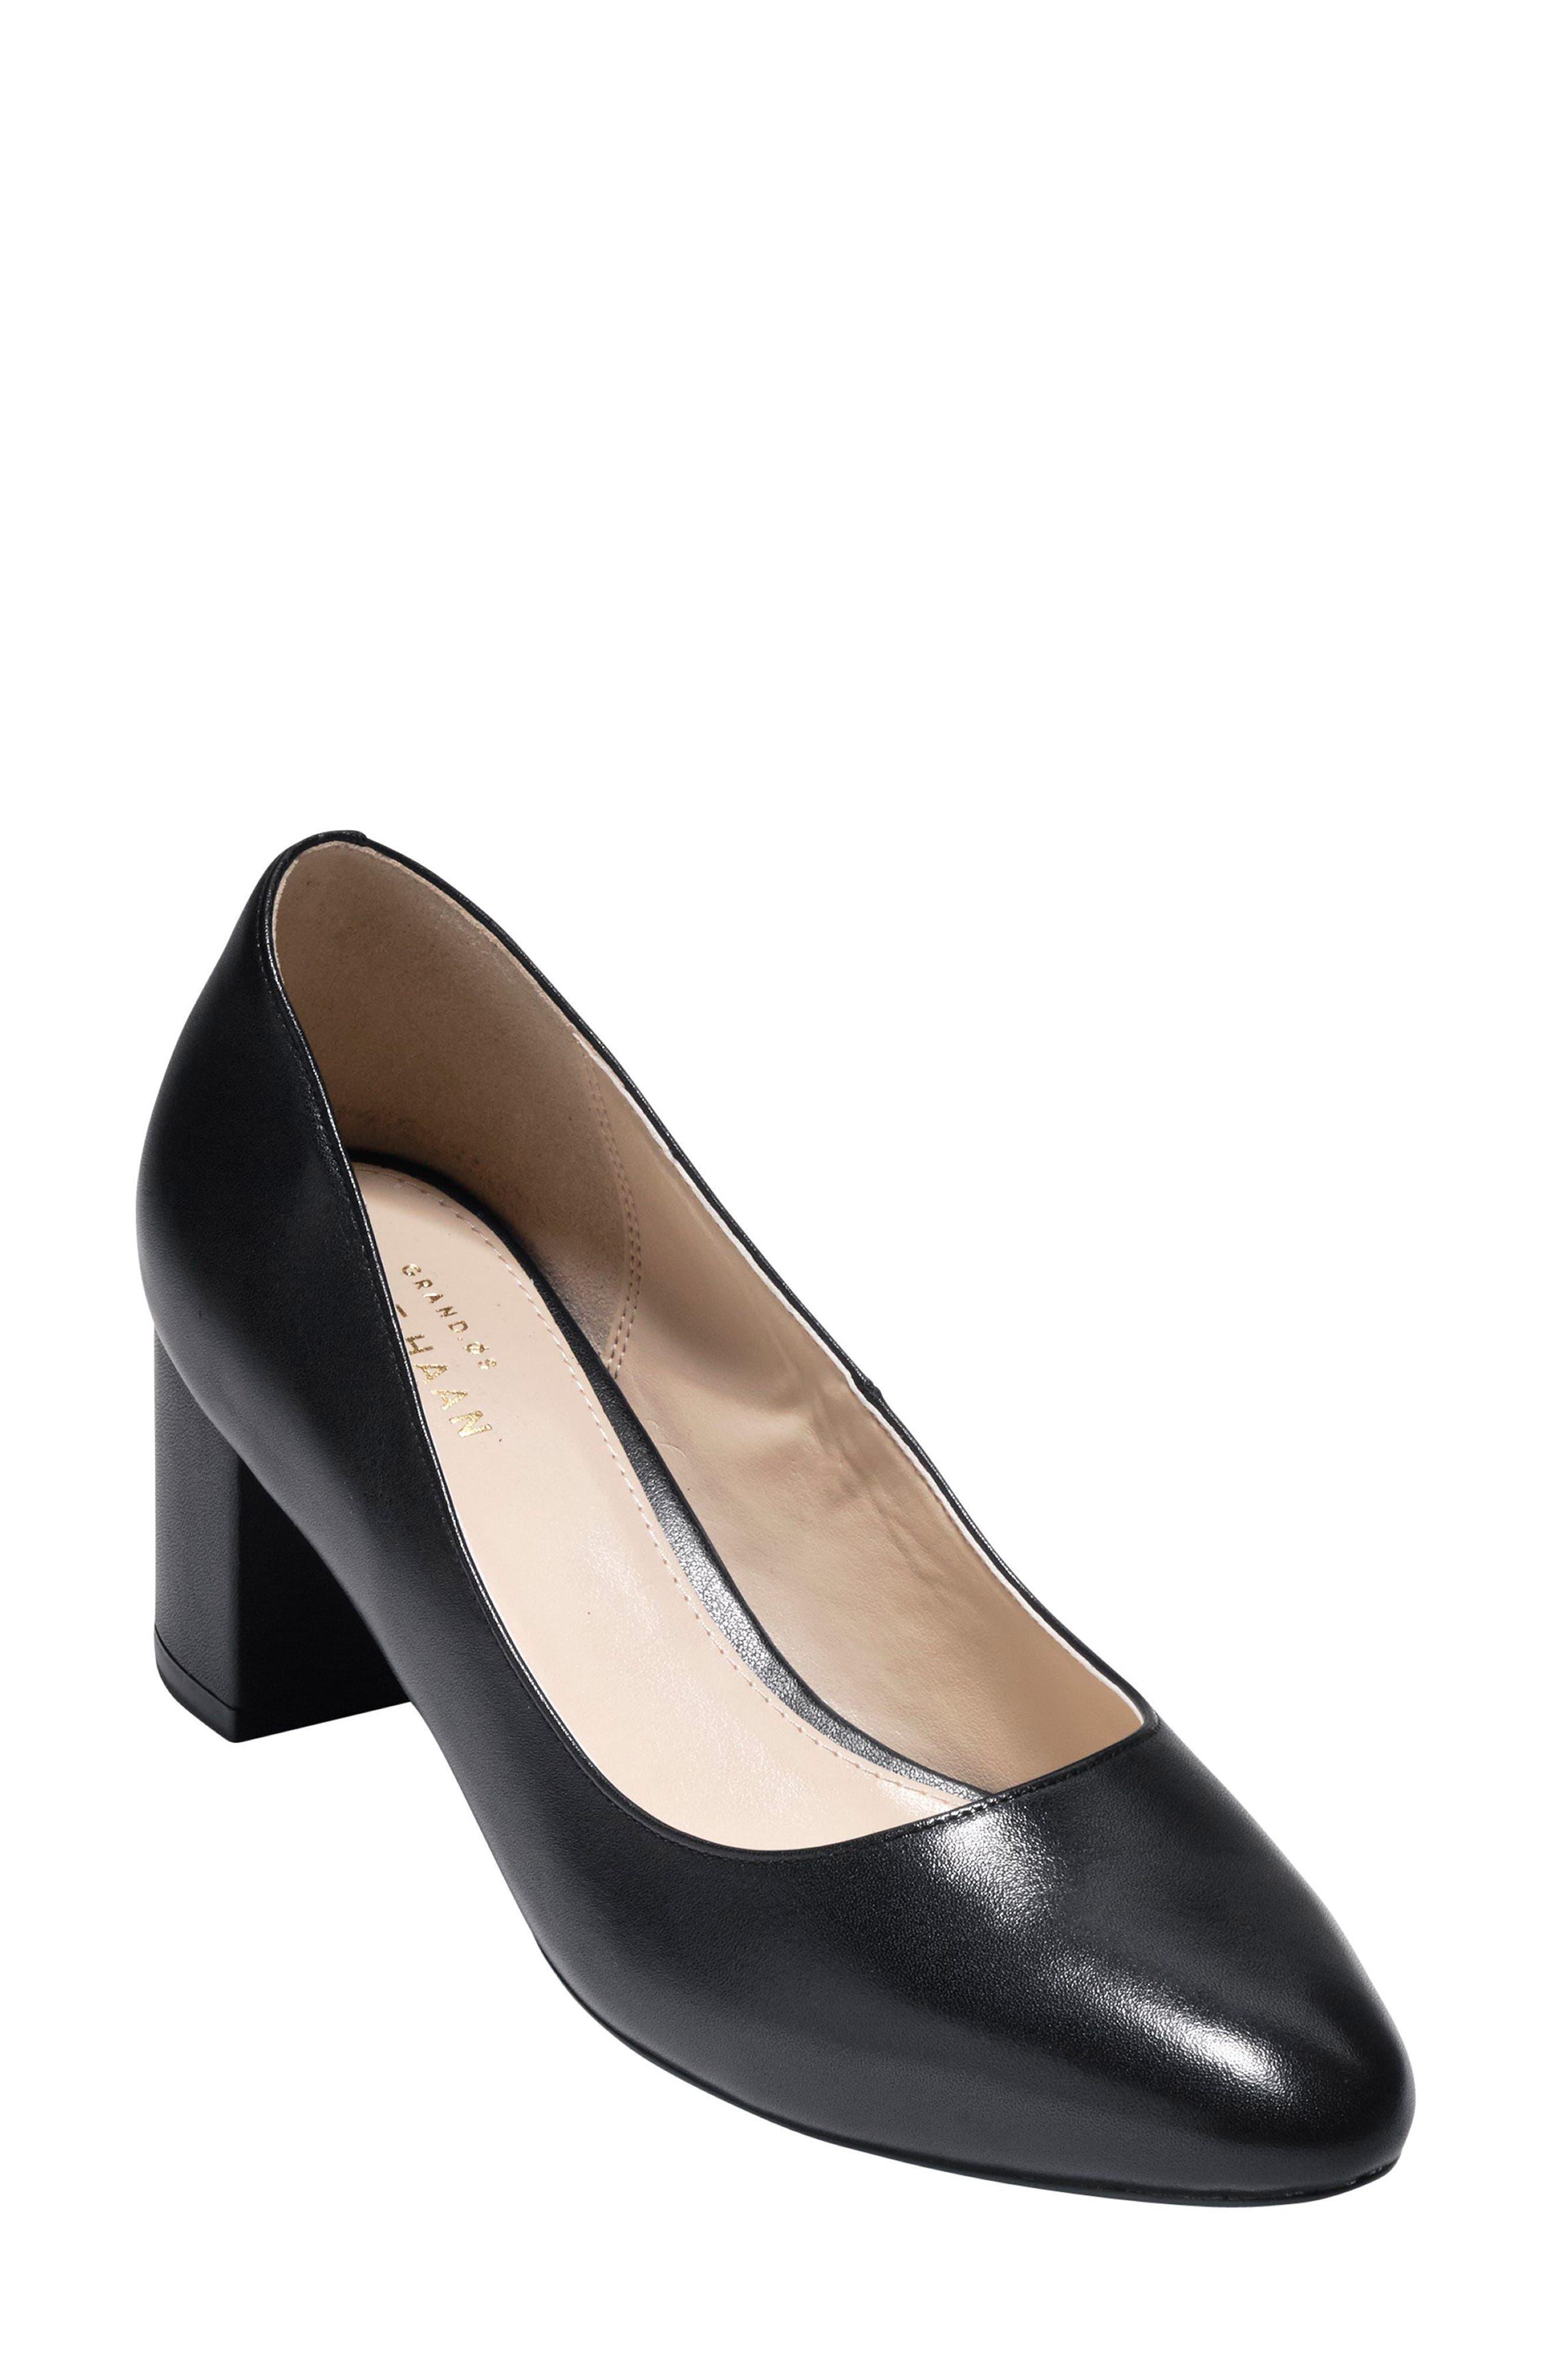 Justine Block Heel Pump,                         Main,                         color, Black Leather